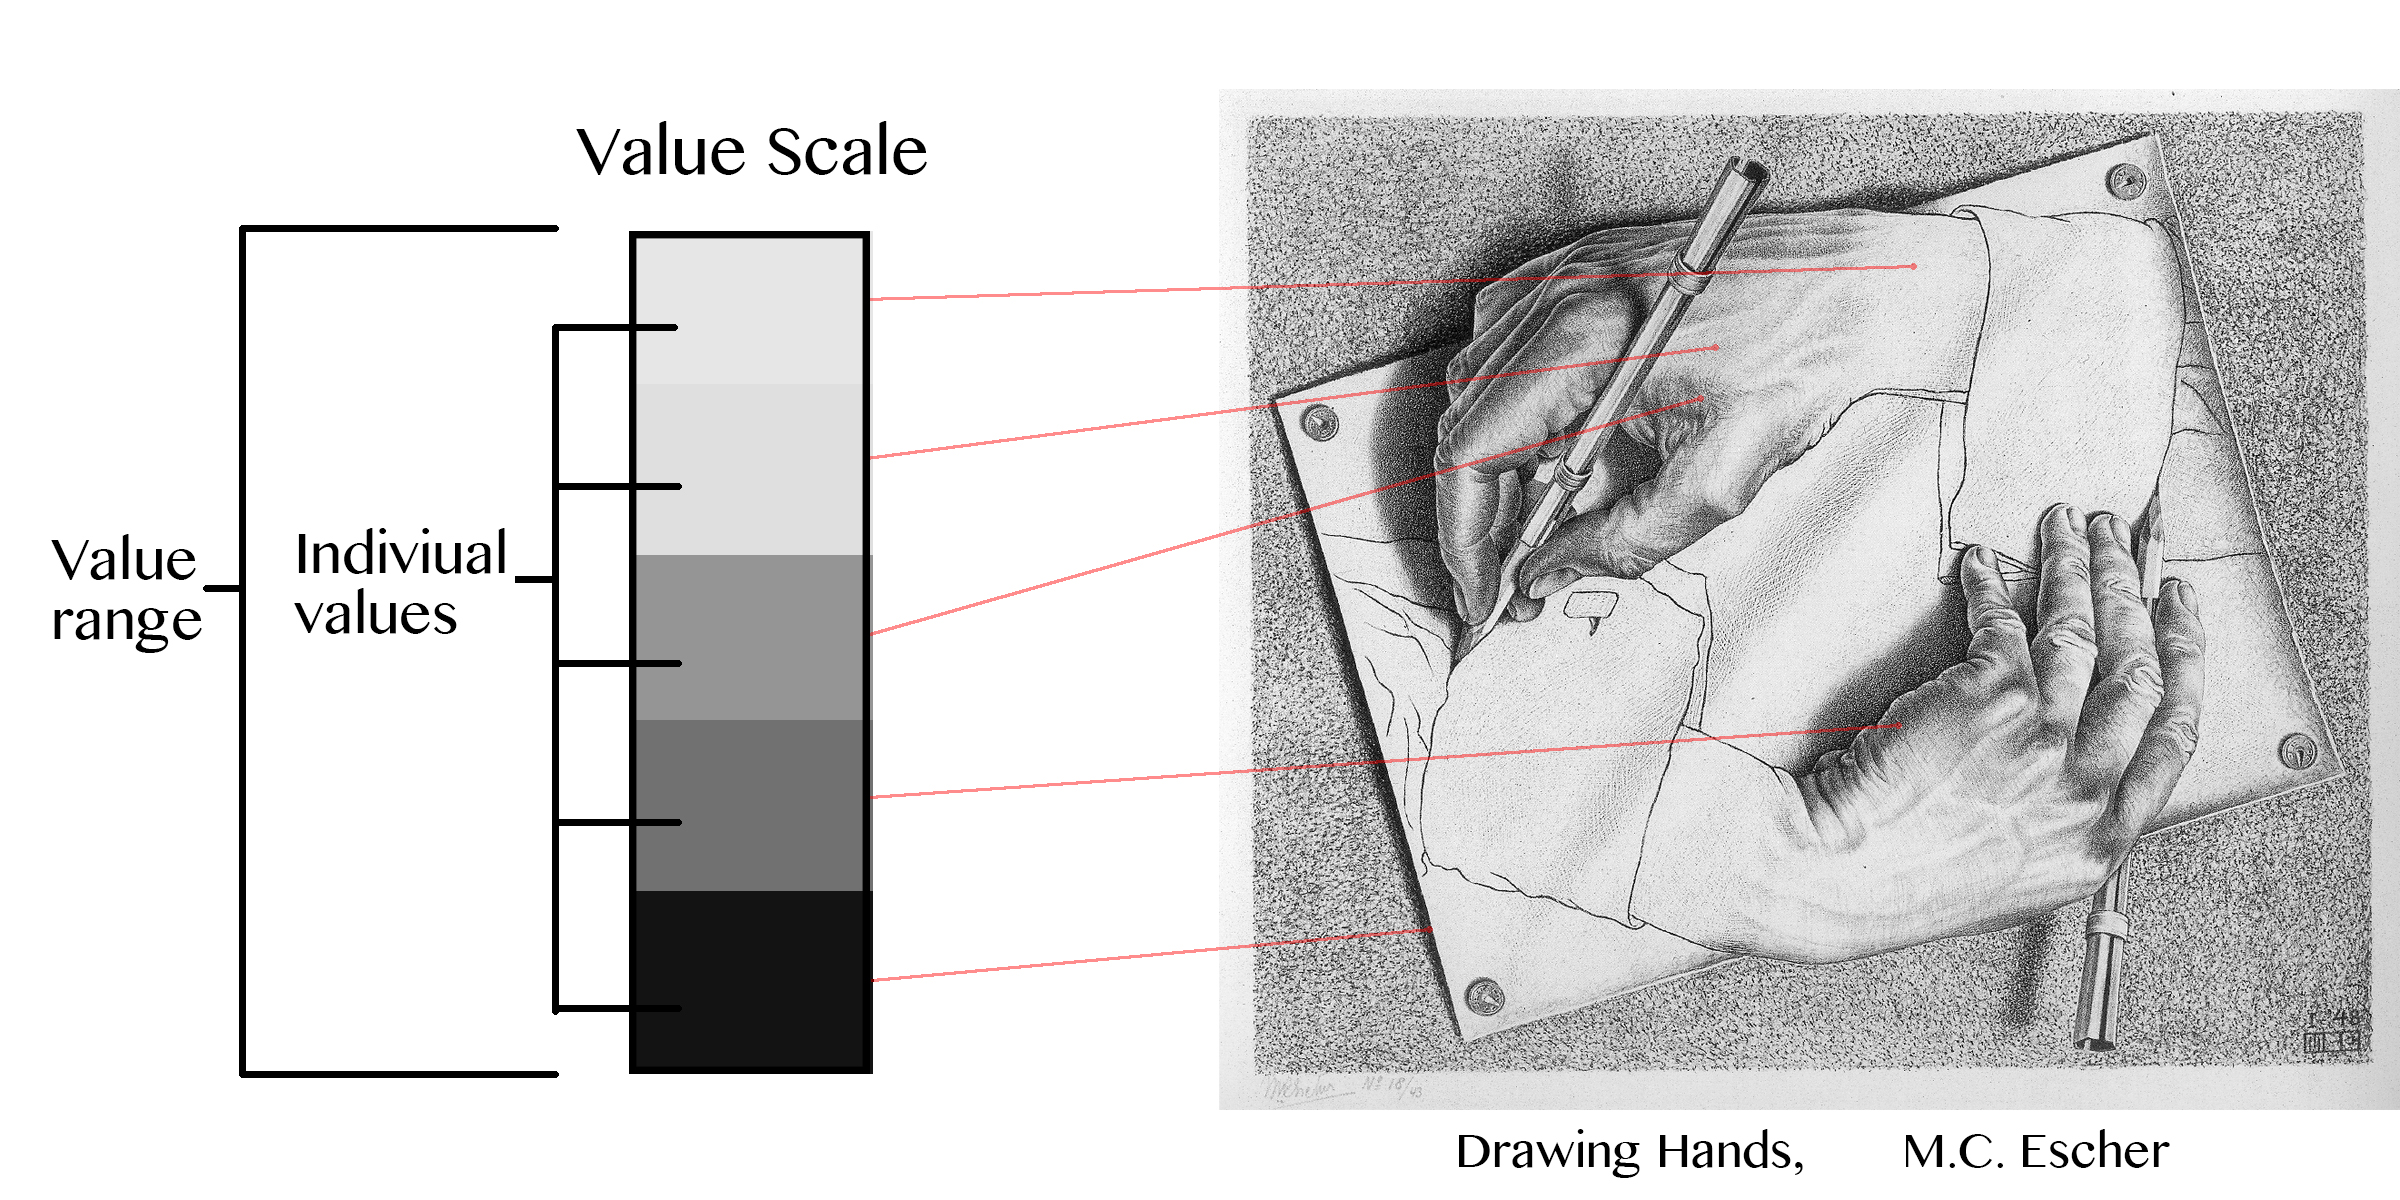 HW 5 values diagram.jpg